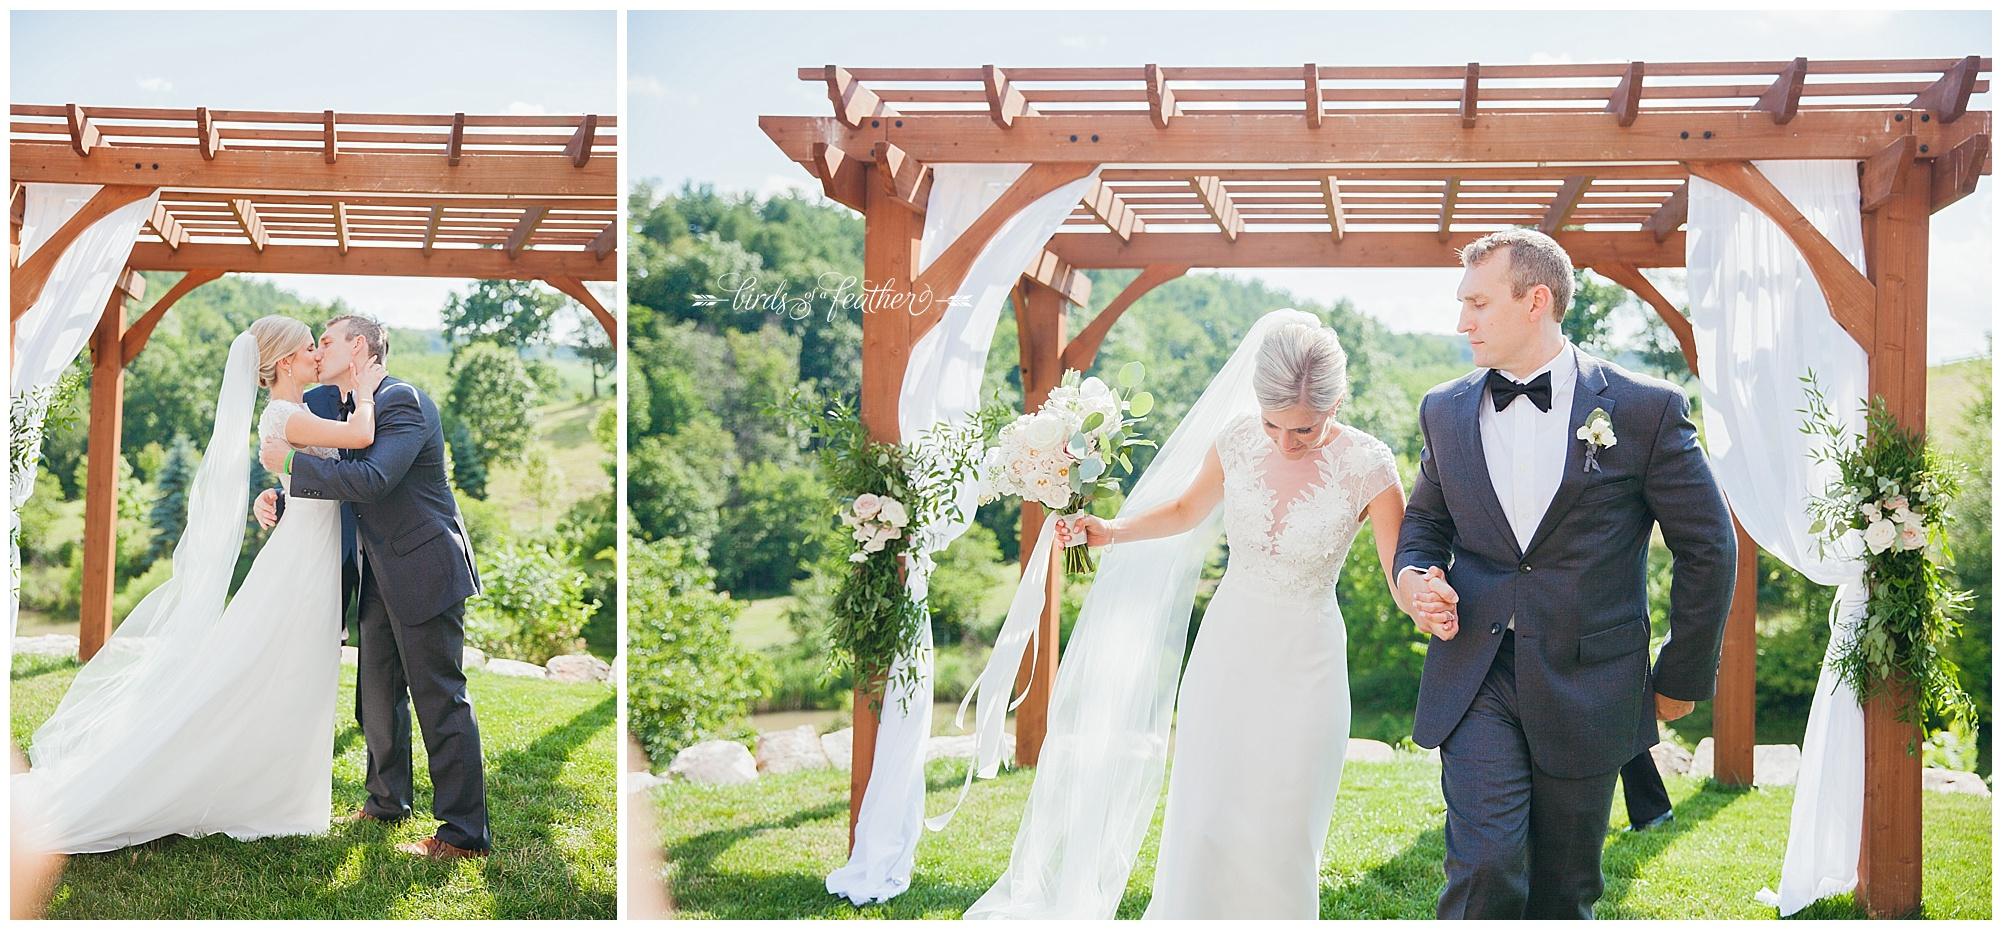 Birds of a Feather Photography, Glasbern Inn Wedding, Fogelsville Pa, Wedding Photography, Wedding Photographer